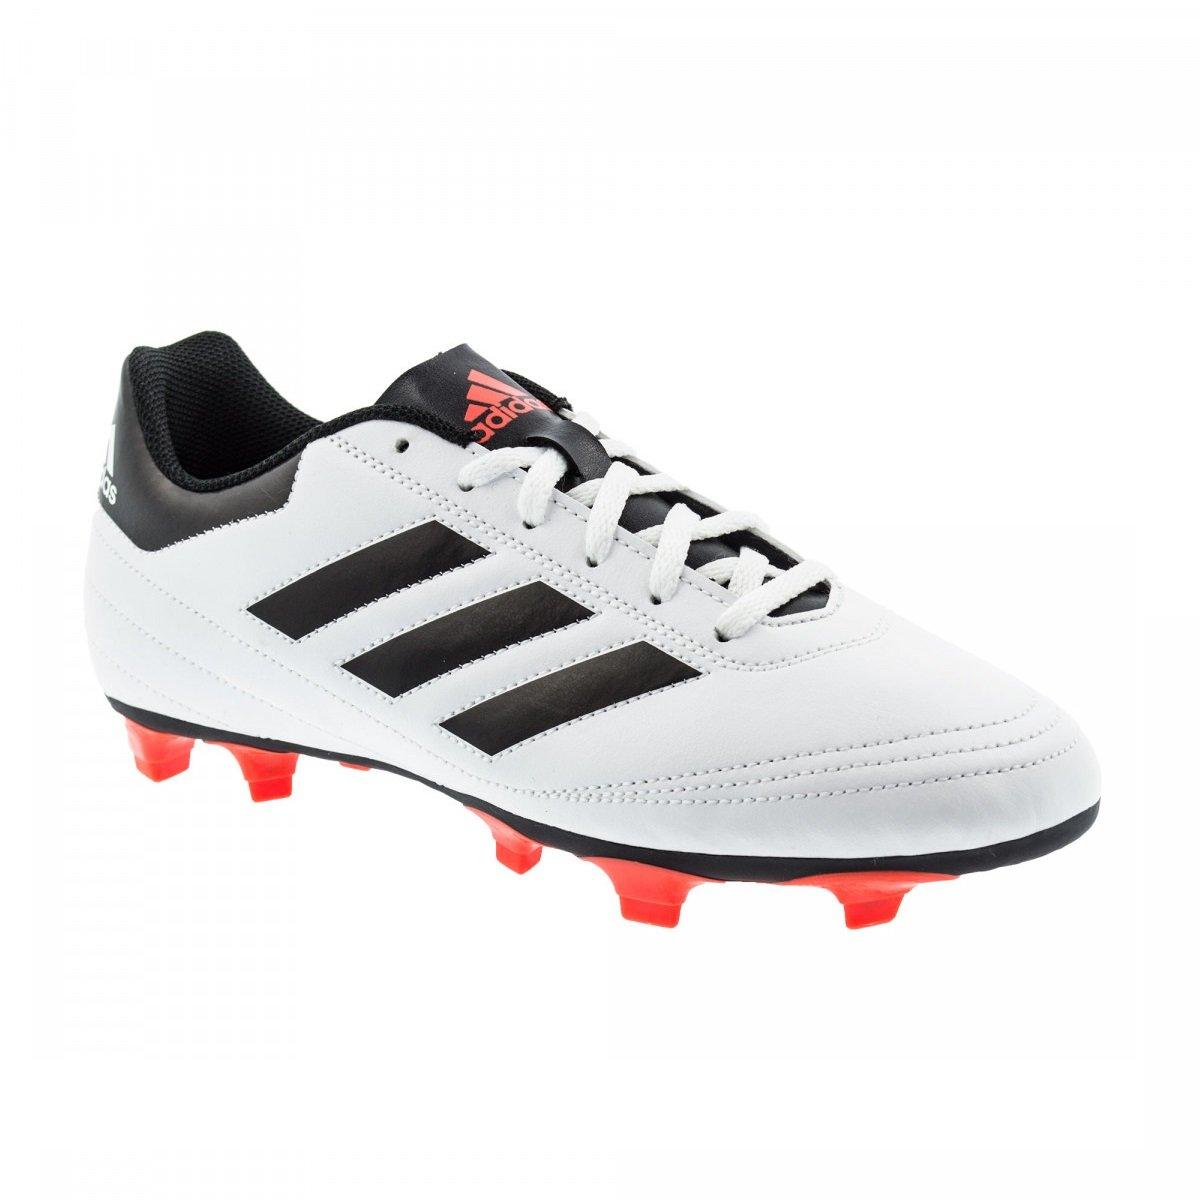 ... uk availability 01c4a e0e45 Chuteira Campo Adidas Goletto 6 FG ... 60ce422e0edcf